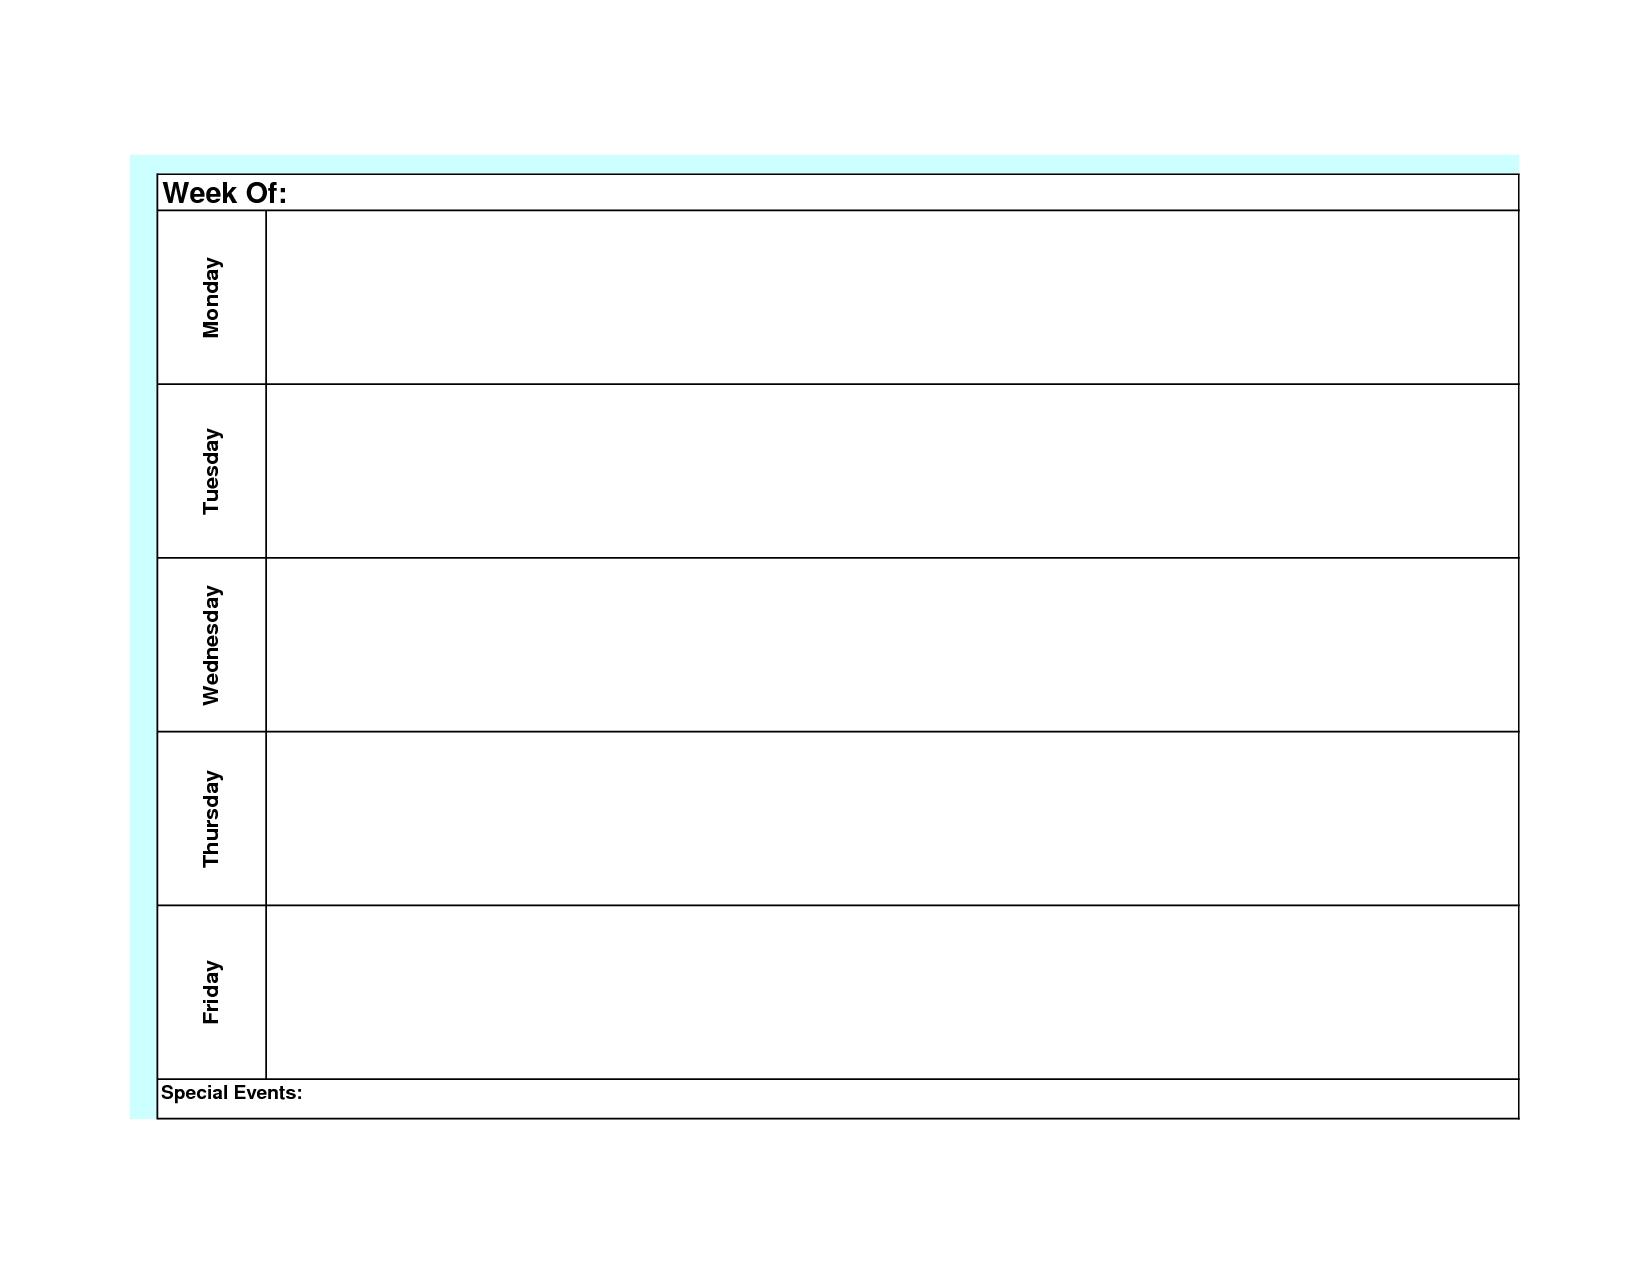 Pick Printable Monday Through Friday Schedule